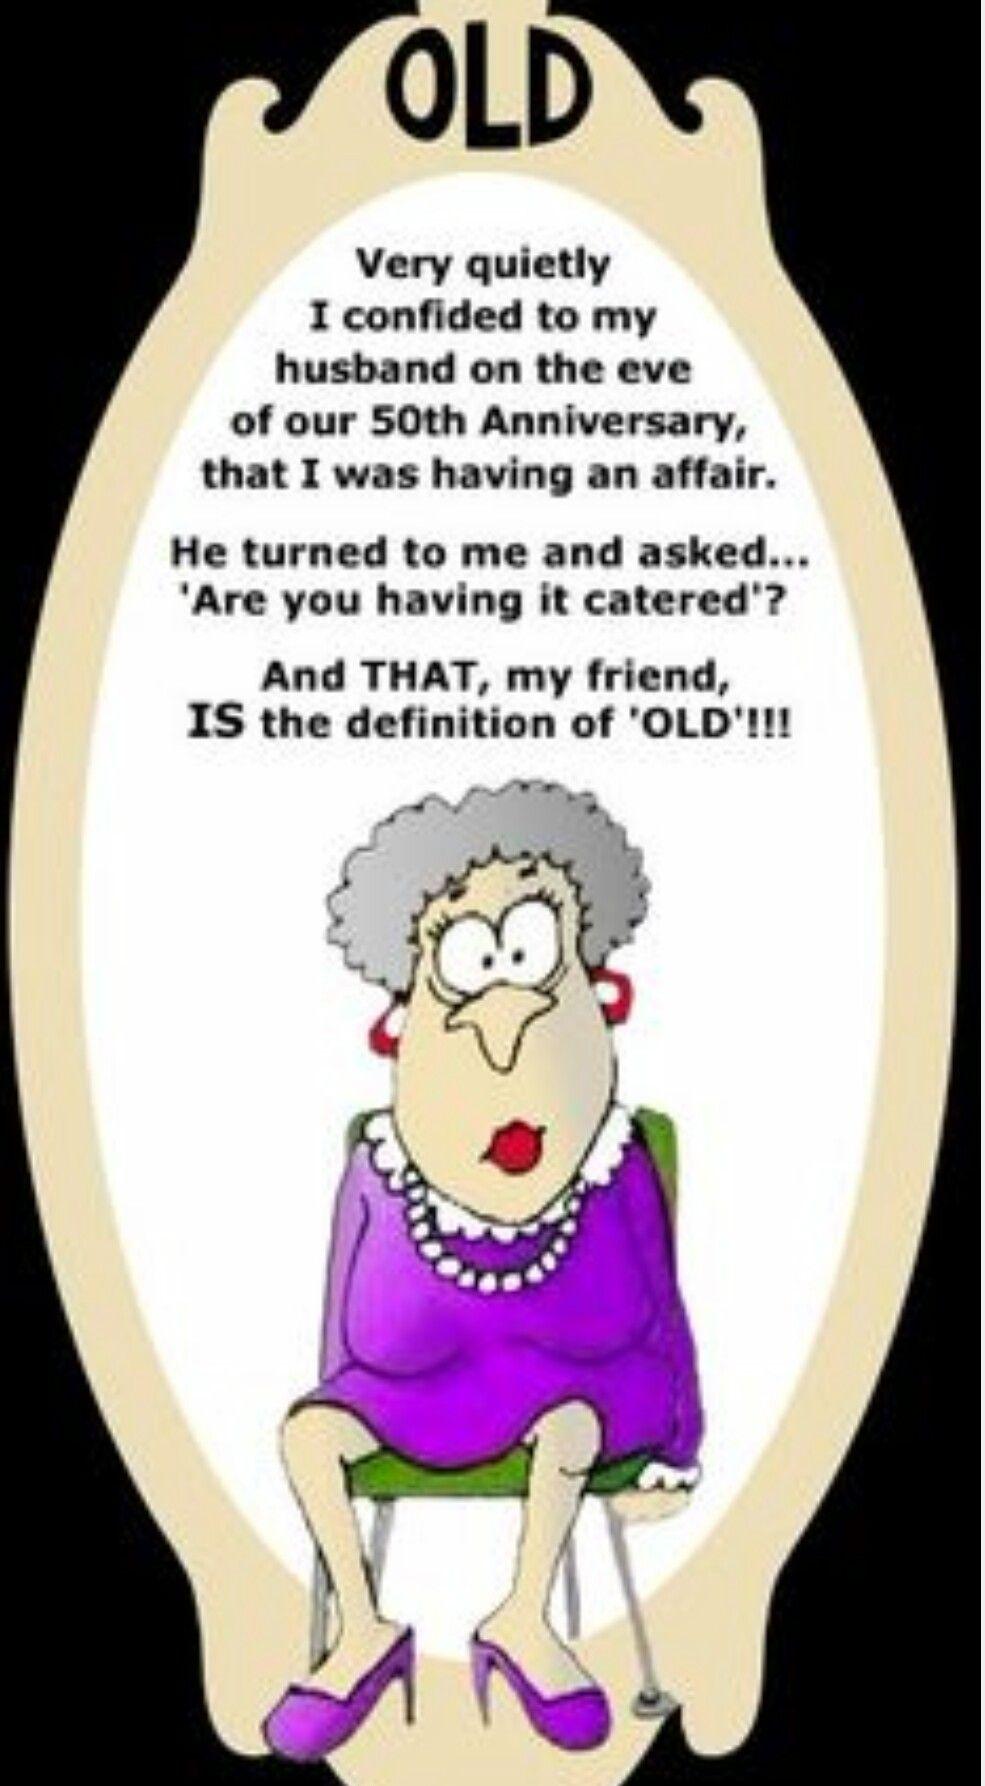 50's And Older Seniors Online Dating Websites